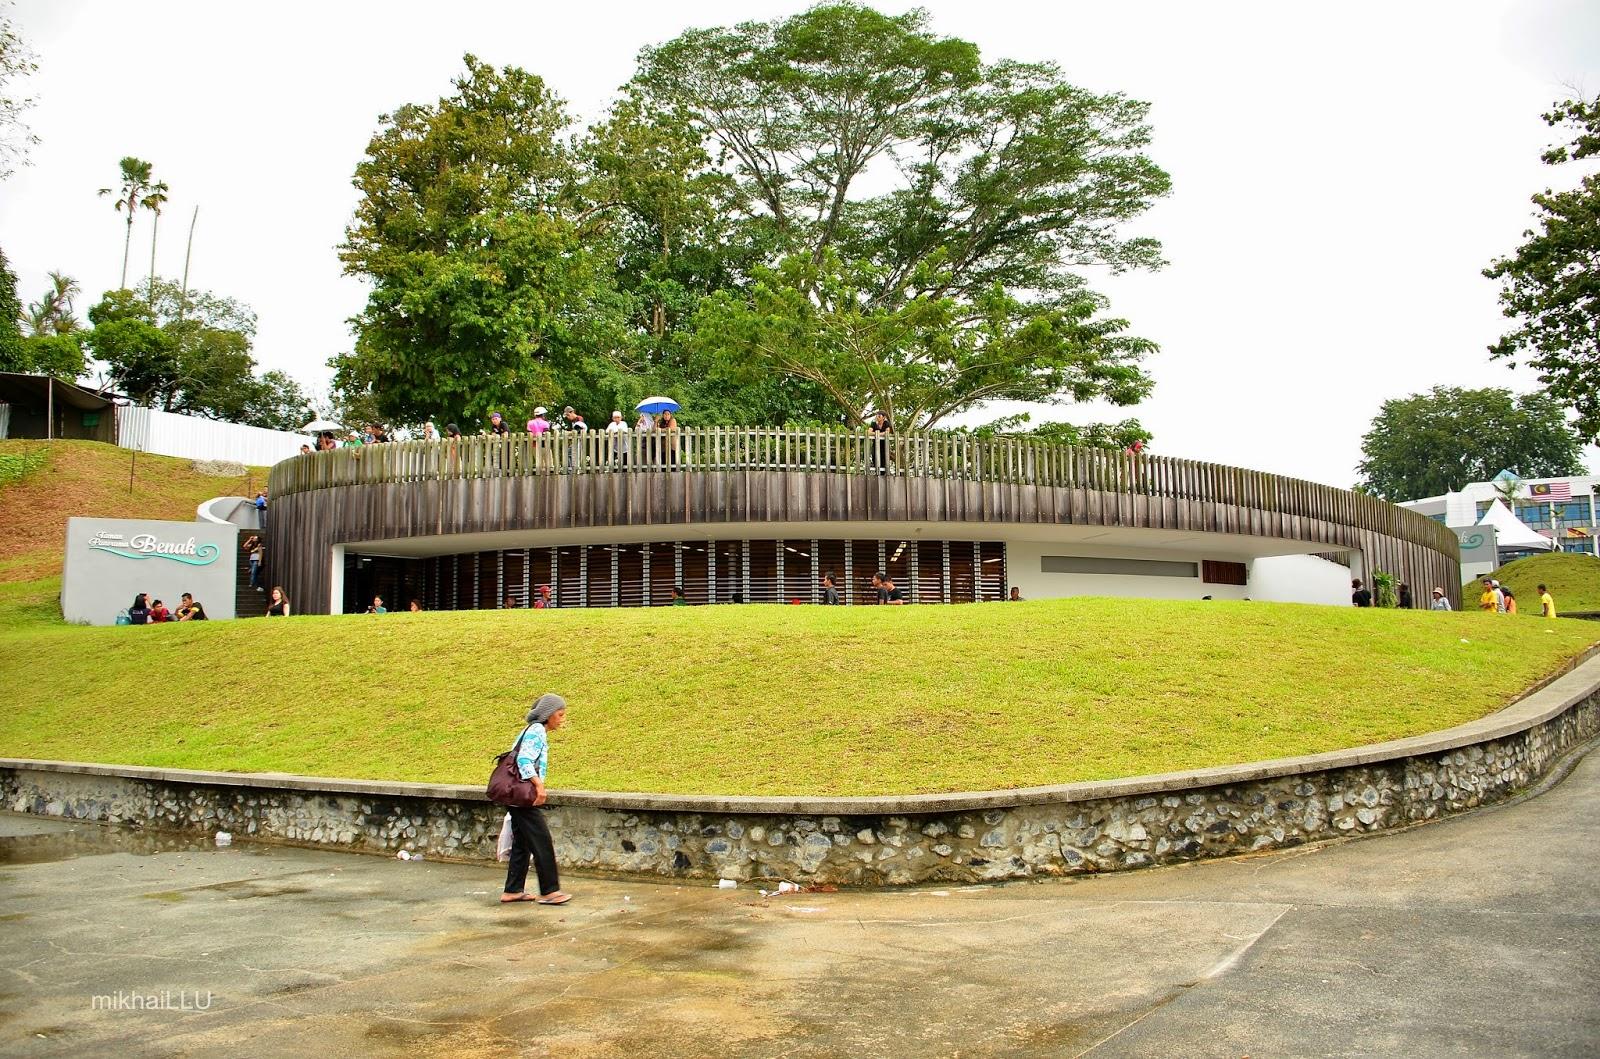 The front view of the Tidal Bore Observatory aka Taman Panorama Benak | mikhaiLLU